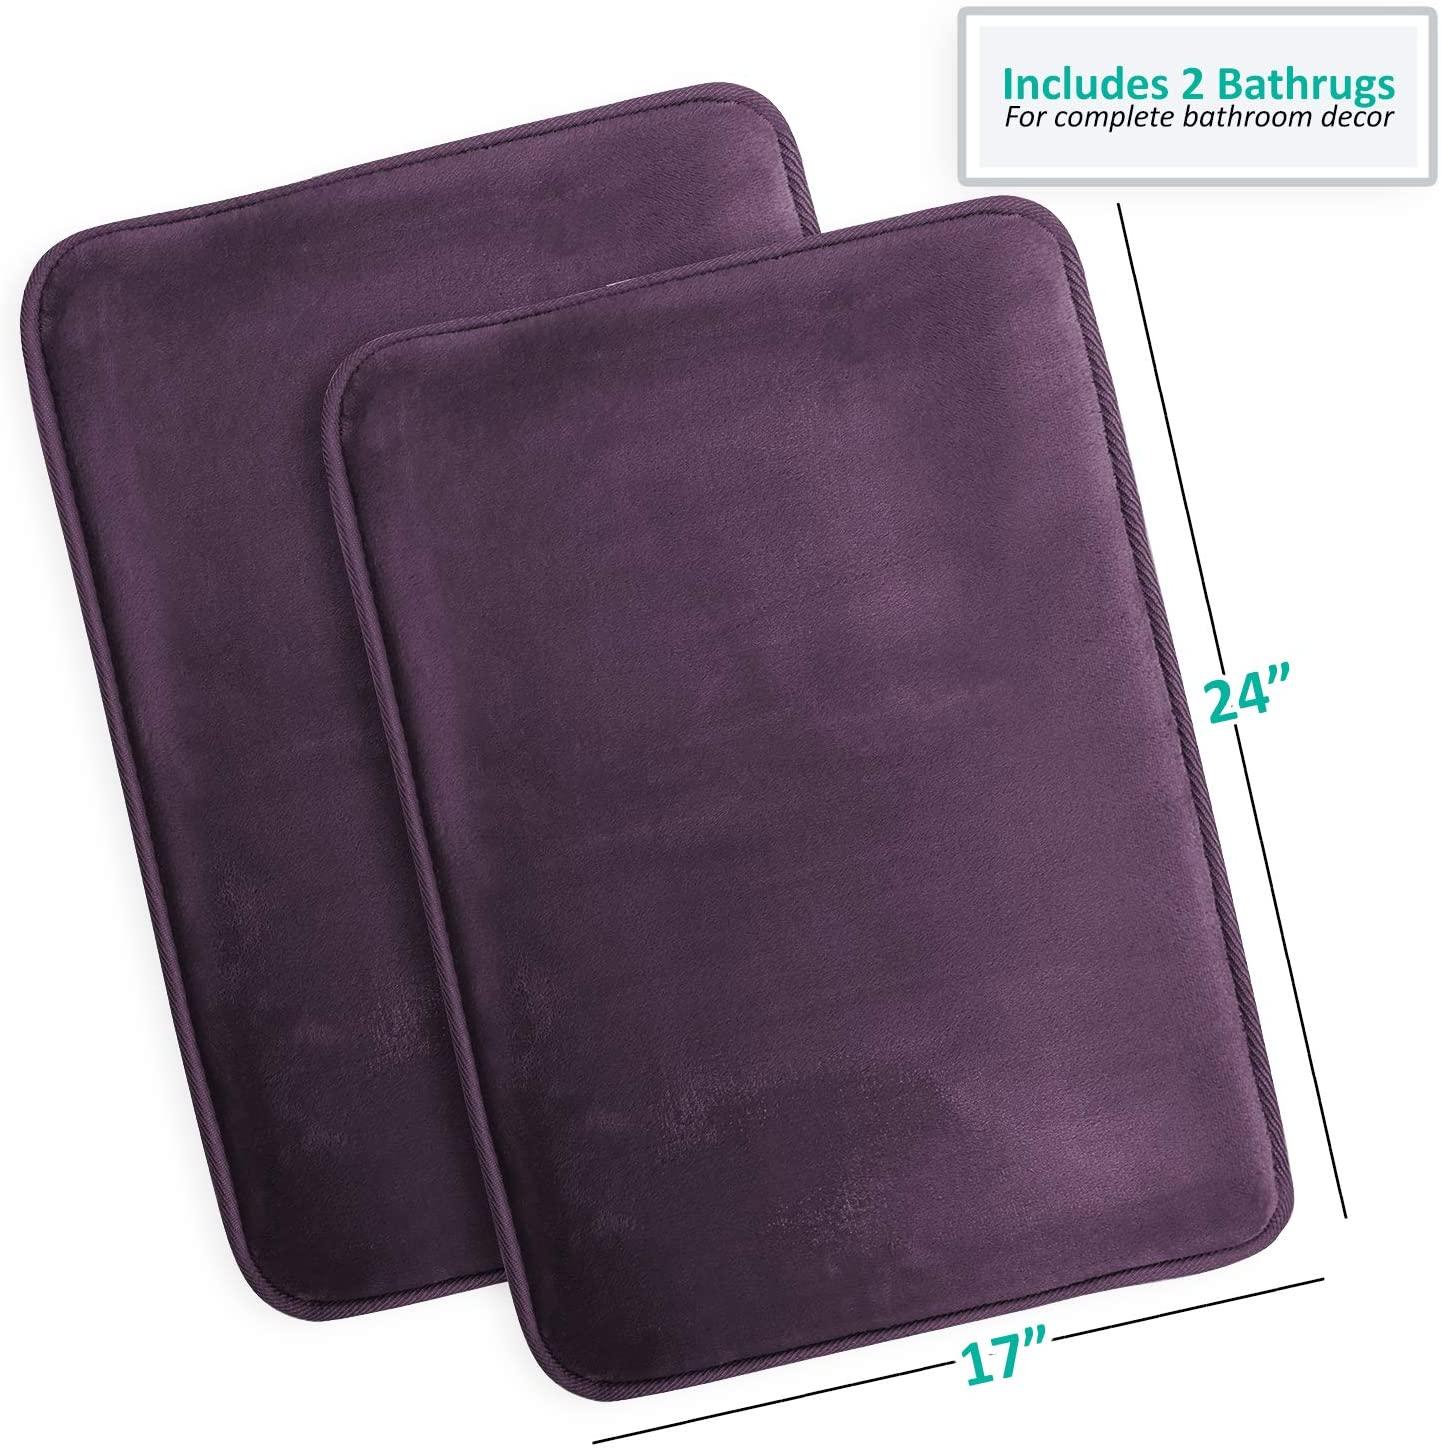 Memory Foam Bathrug 2 Pack Set – Eggplant - Bath Mat and Shower Rug Small 17